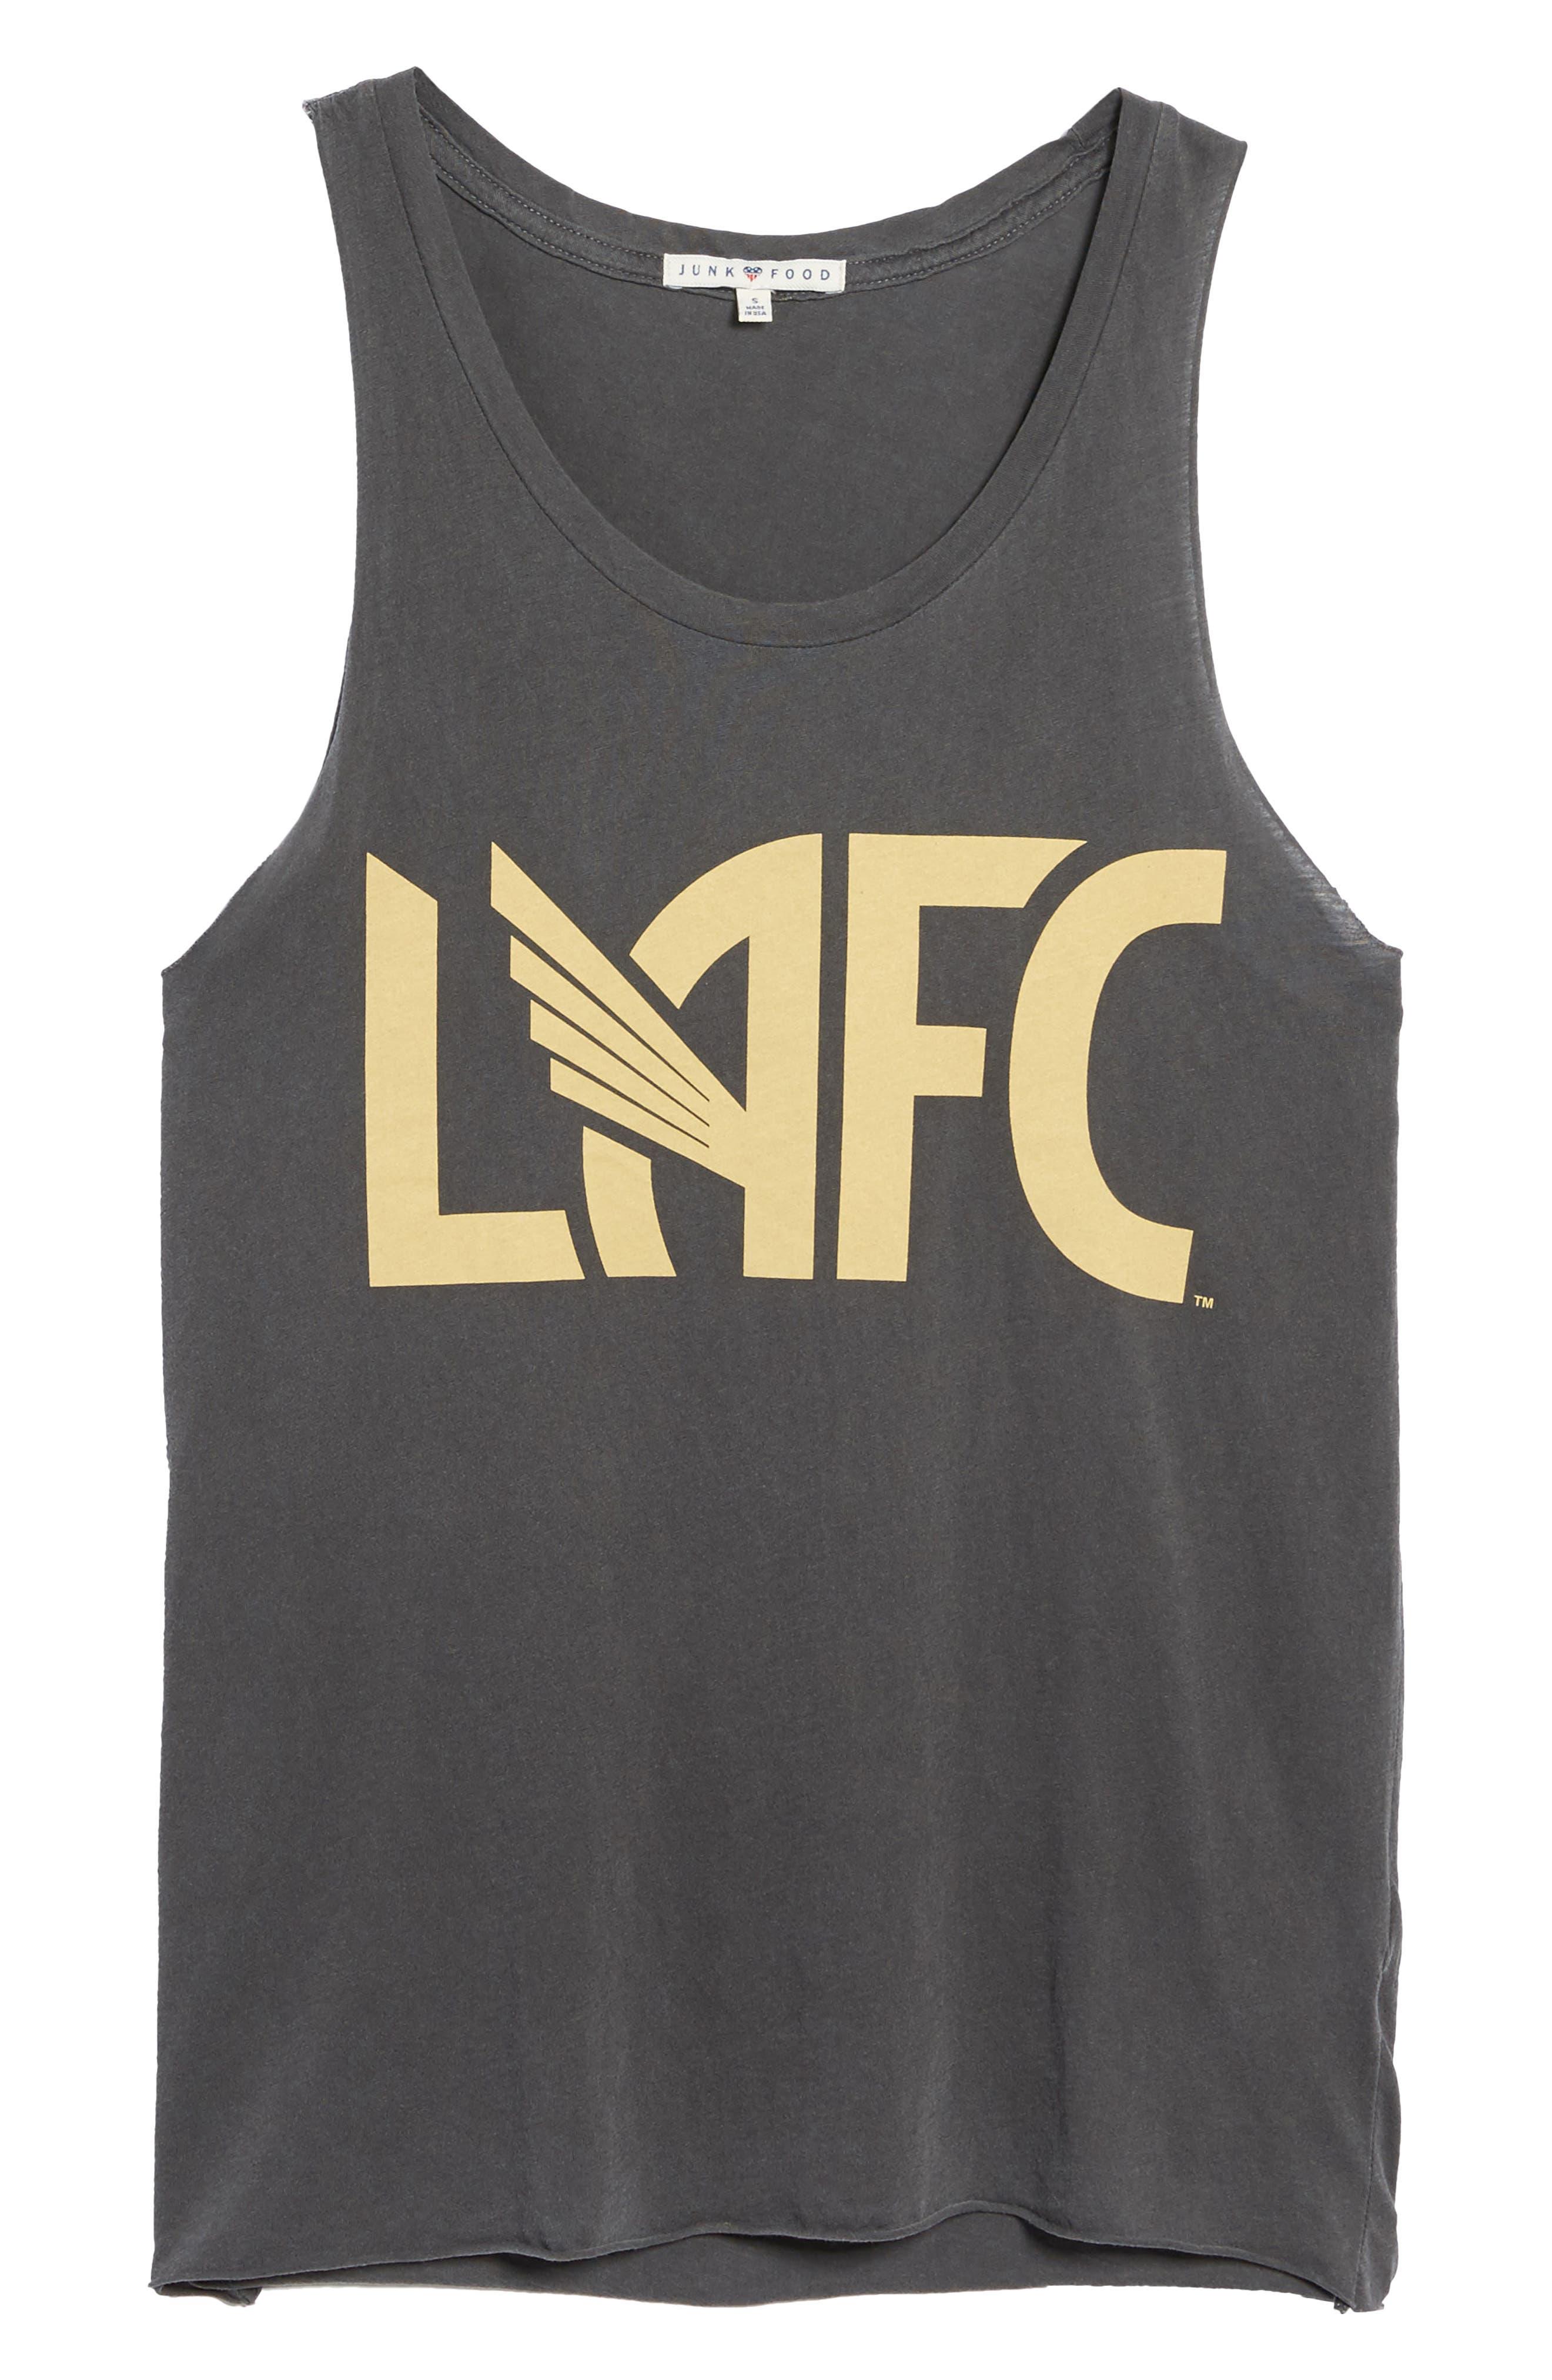 Los Angeles FC Tank,                             Alternate thumbnail 6, color,                             001